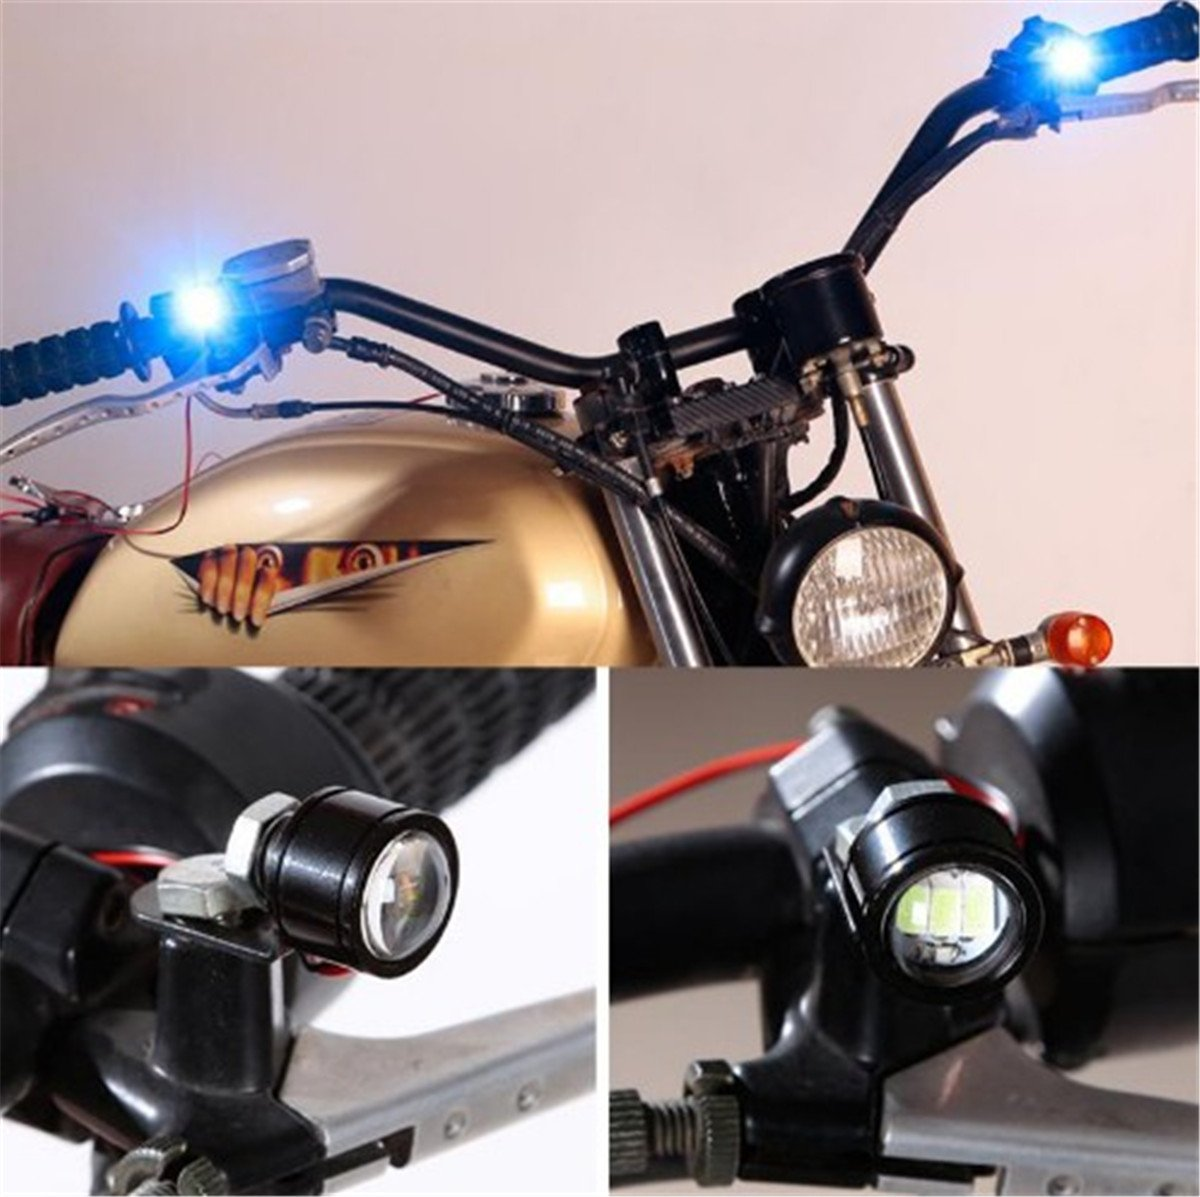 Fochutech 2 pcs 12V Bright Waterproof Motorcycle LED Headlight Spotlight Assist Lamp Rearview Mirror Strobe Light Universal Ice Blue, Constant